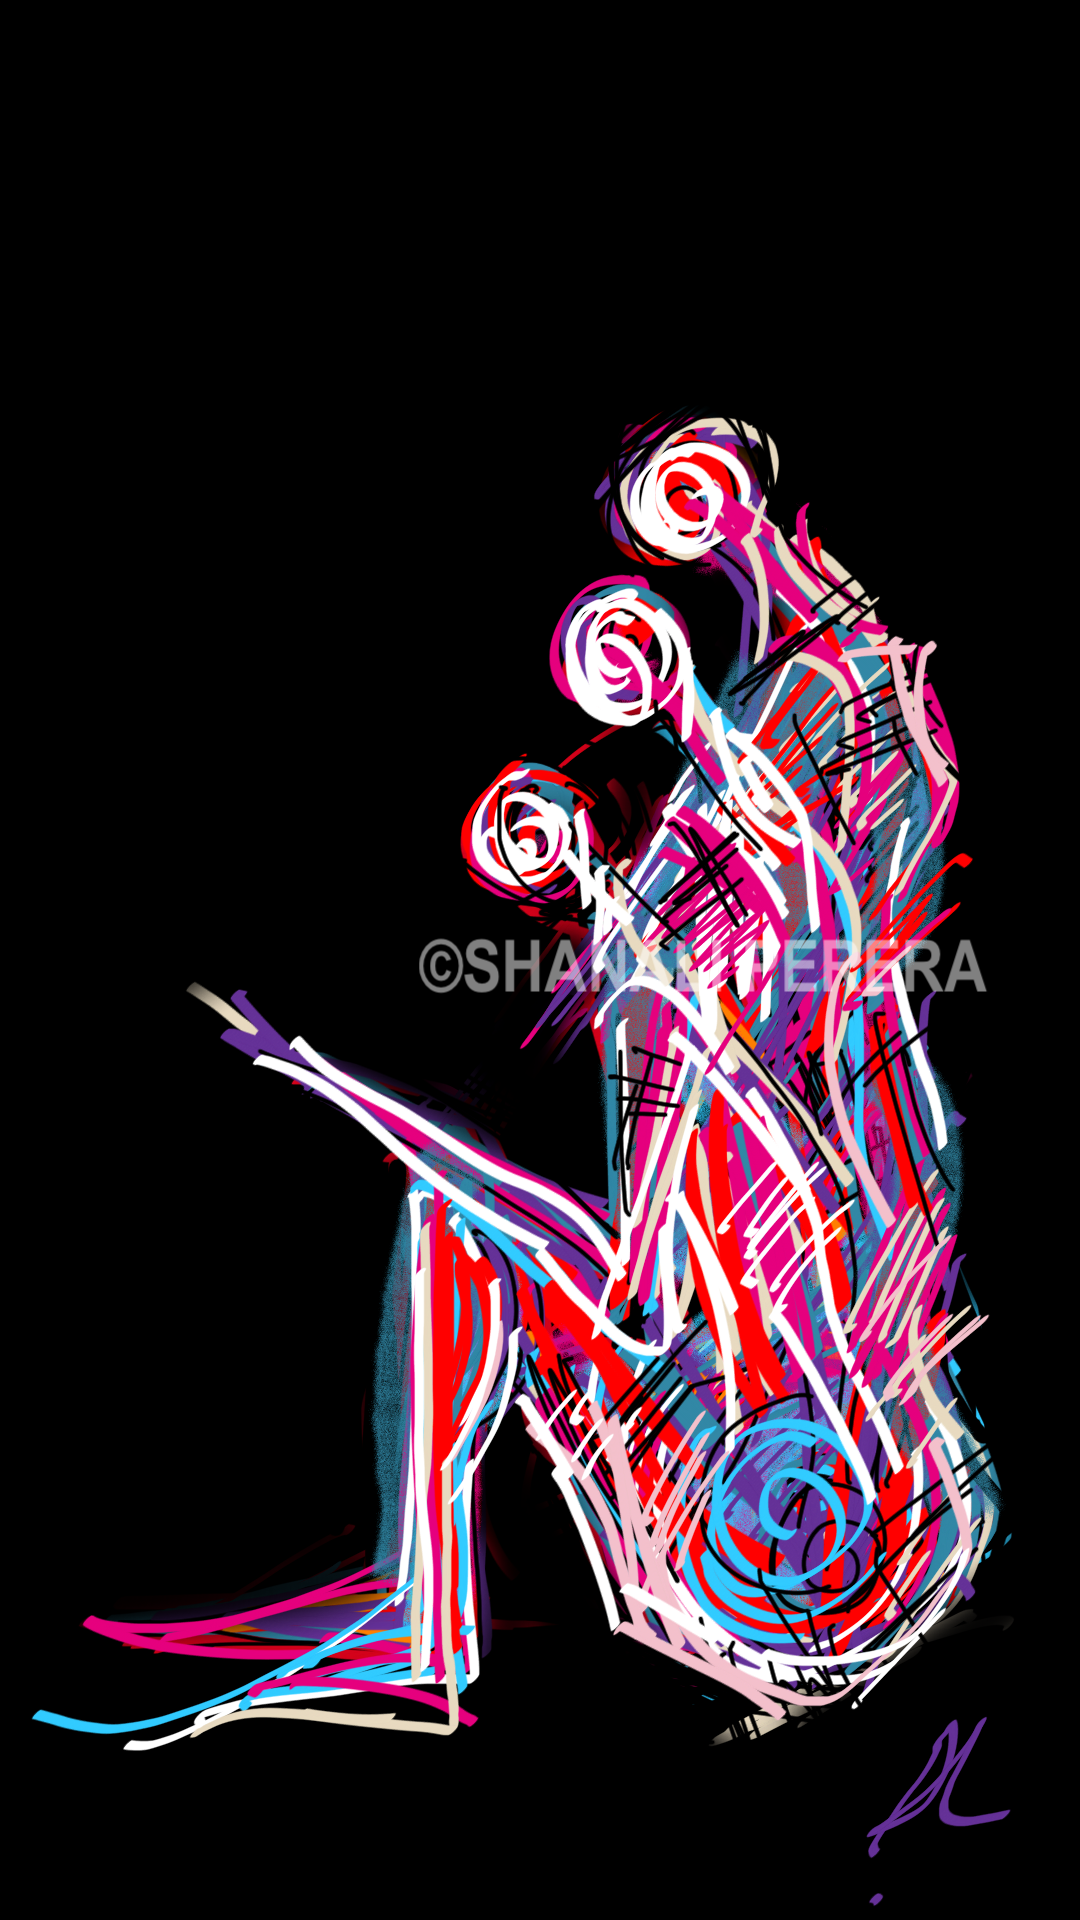 sketch-1518958115743.png